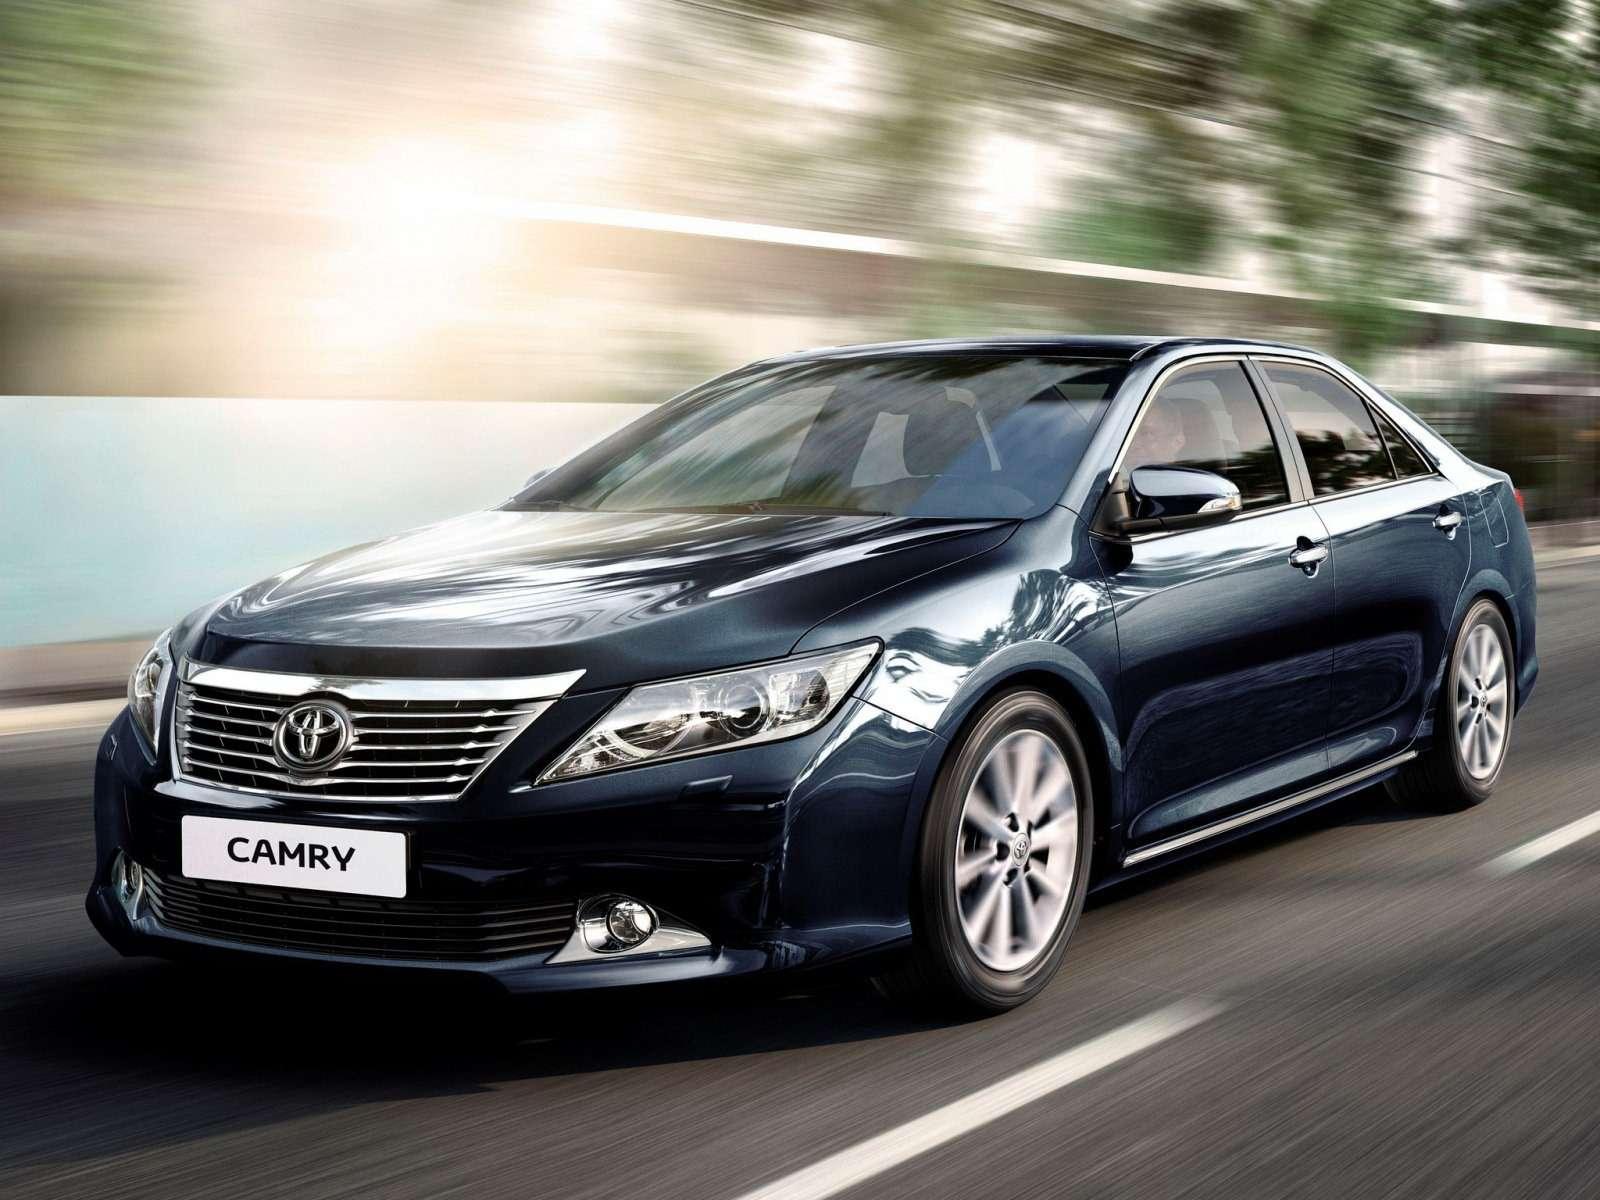 Toyota_Camry_Sedan_2011